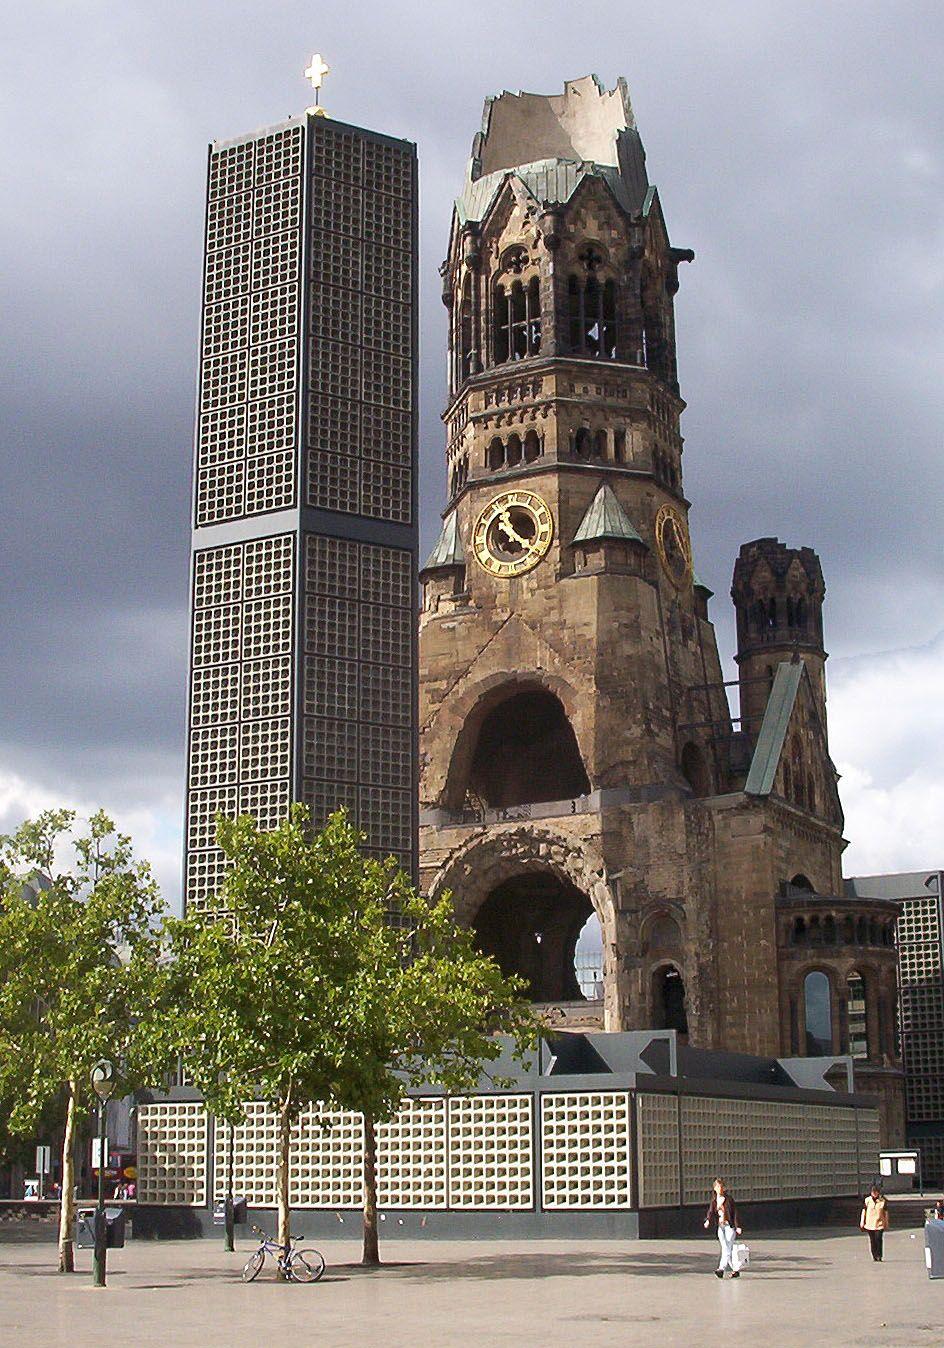 Berlin Gedachtniskirche Berlin Breitscheidplatz Berlin Urlaub